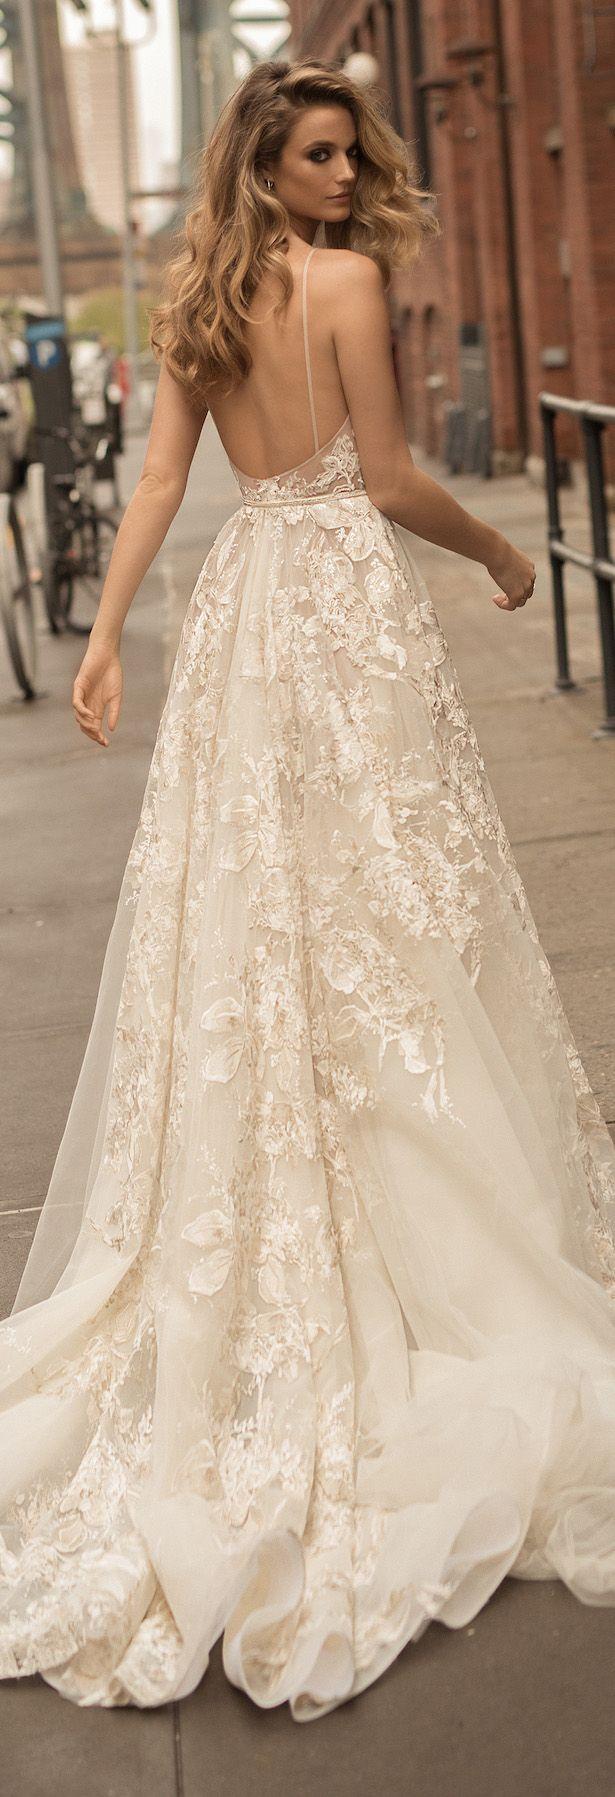 2019 year looks- Dresses wedding spring